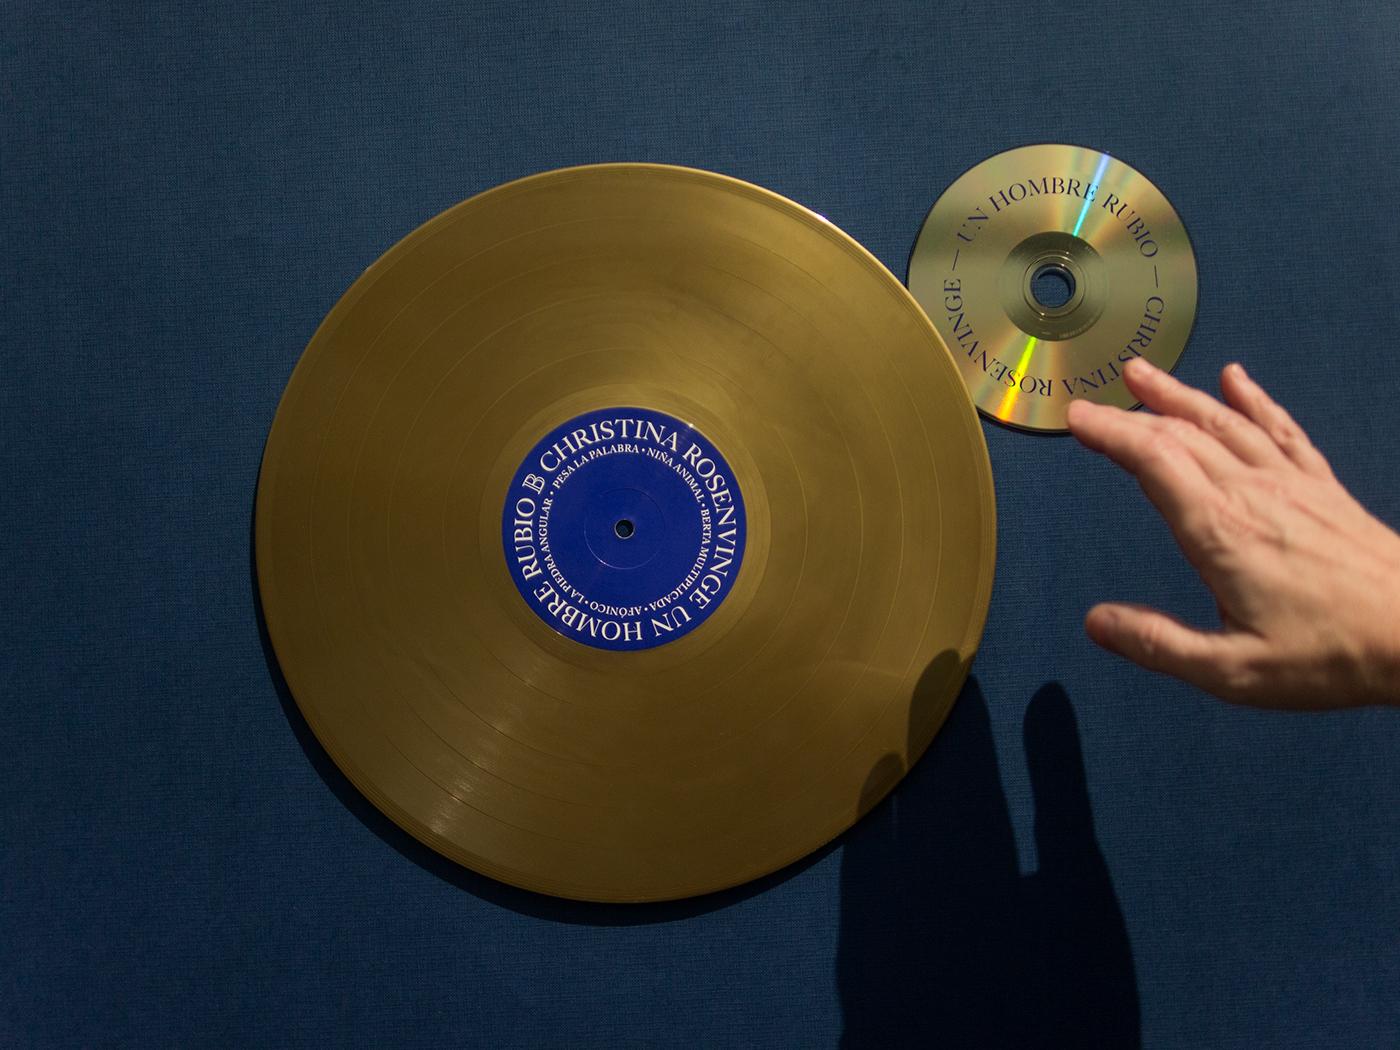 Rosenvinge unhombrerubio artwork music vinyl collage gold